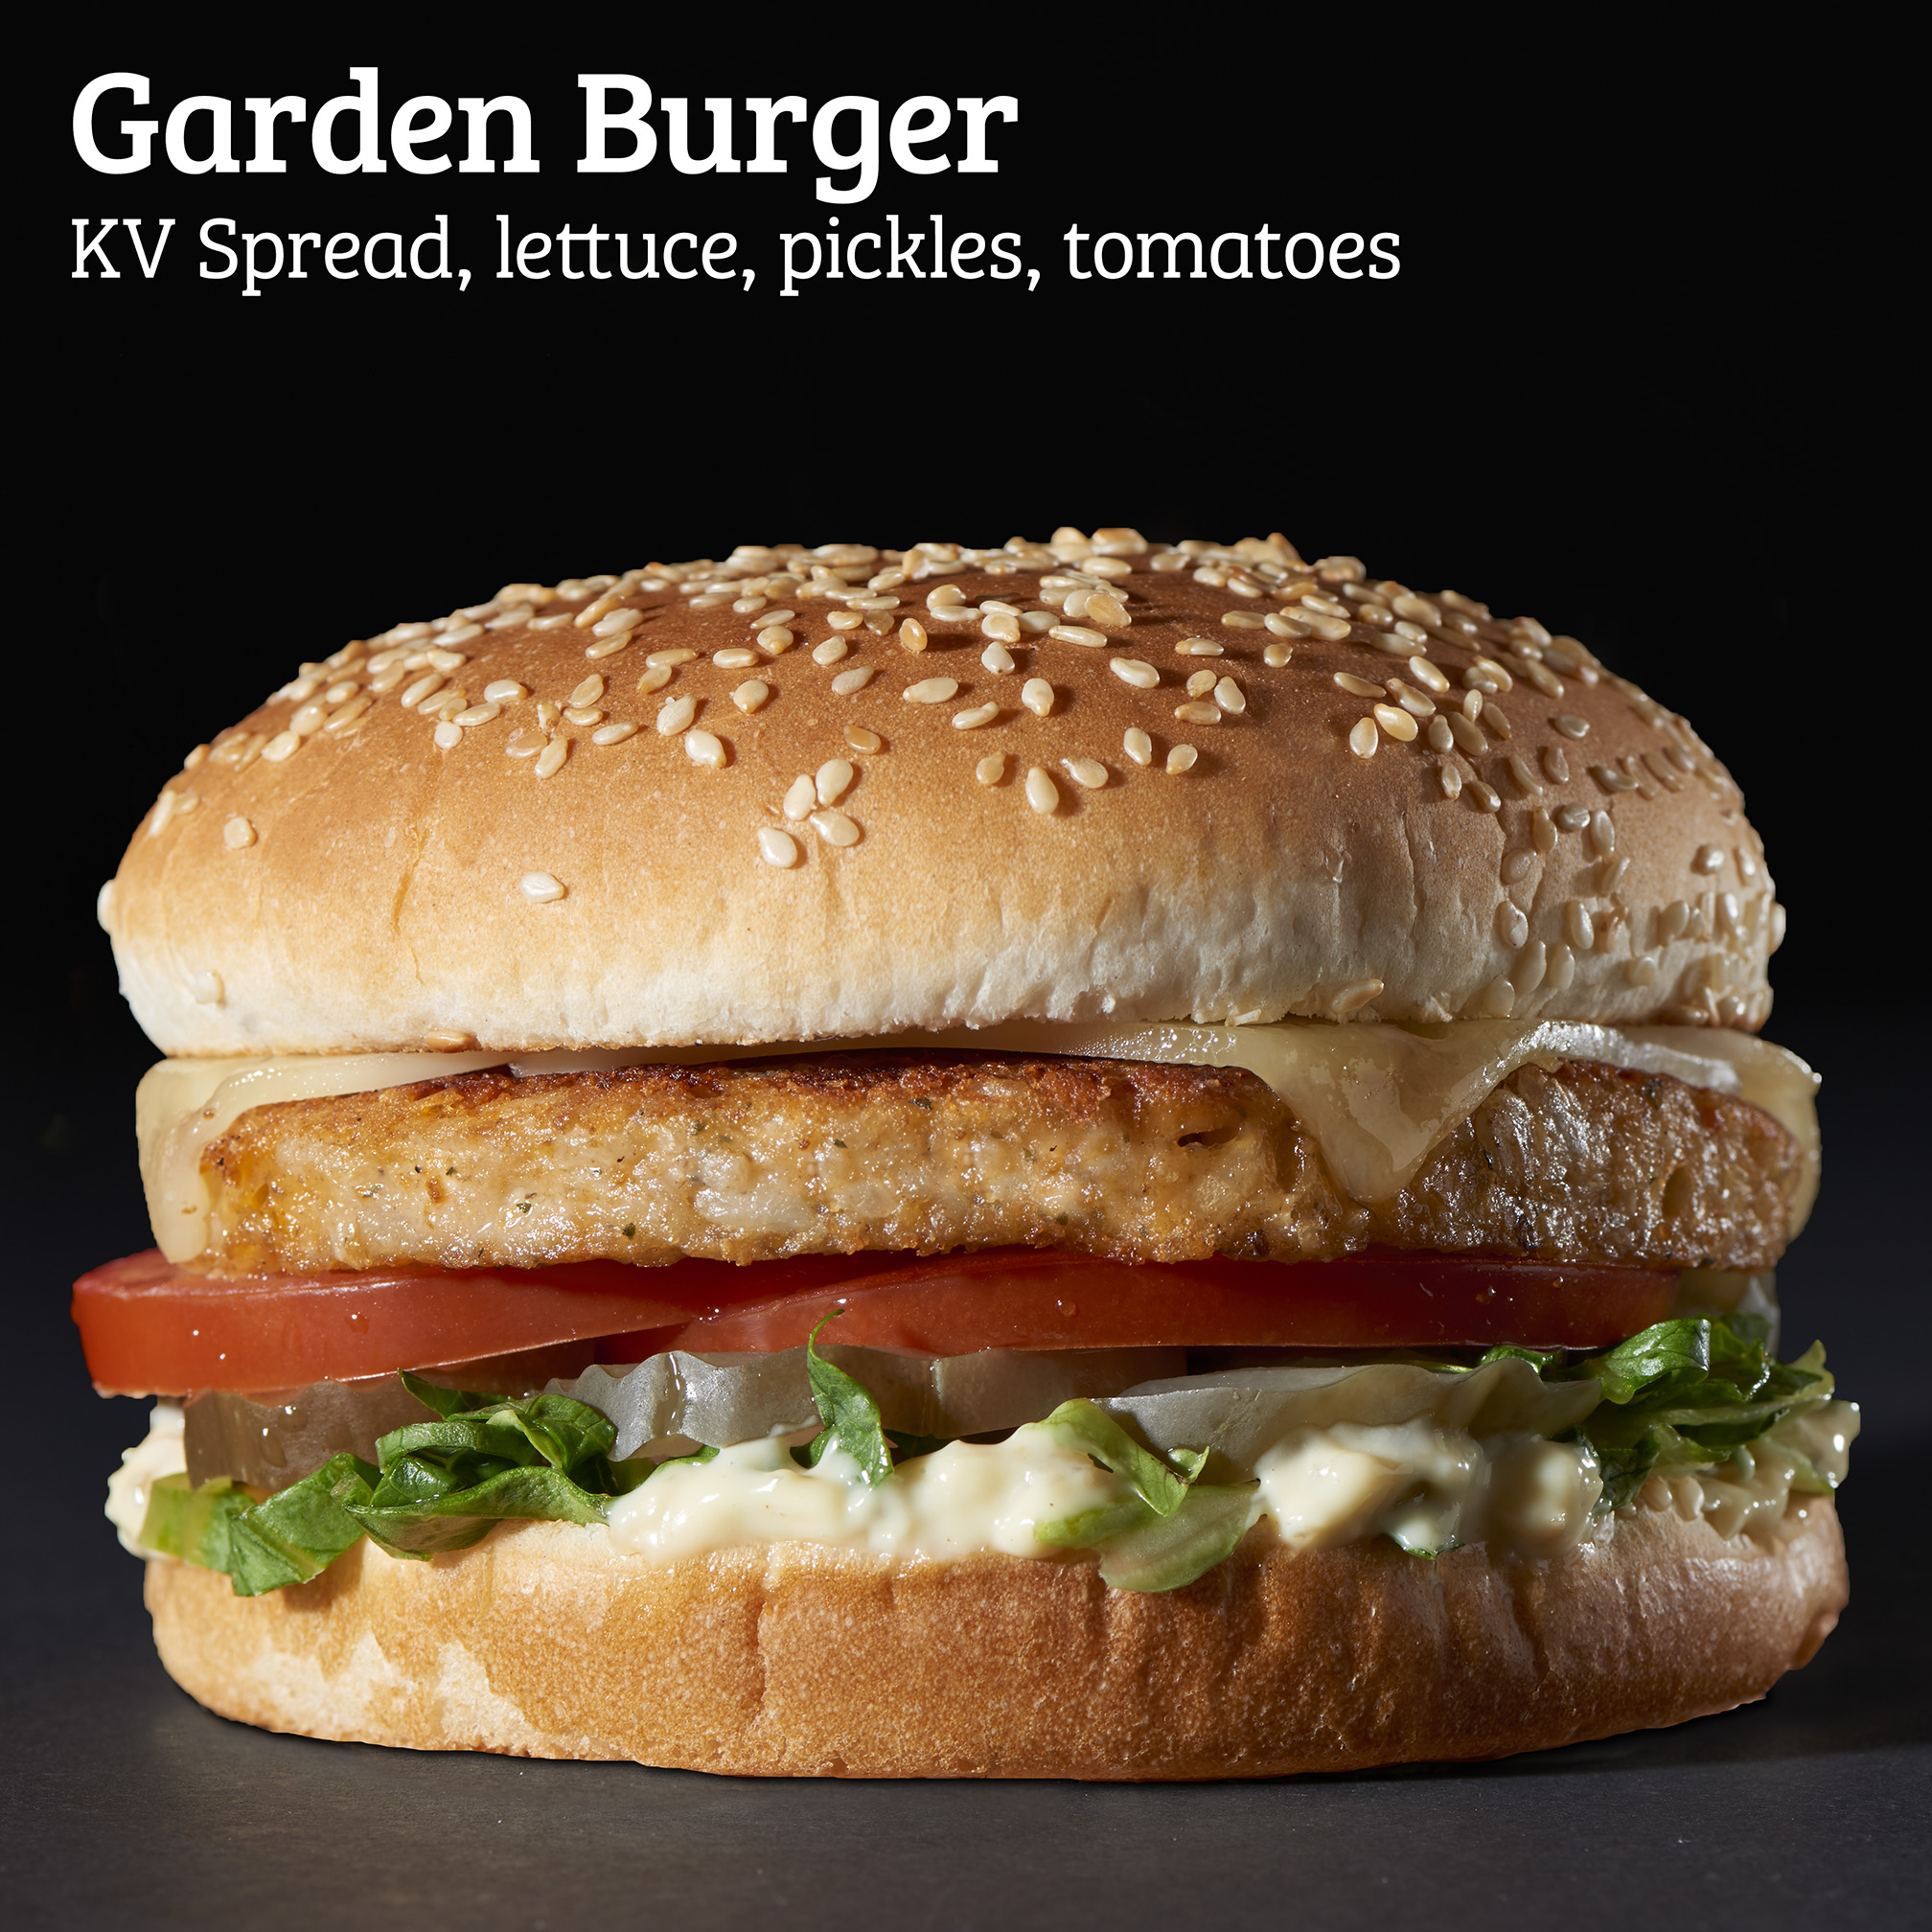 GardenBurger.jpg